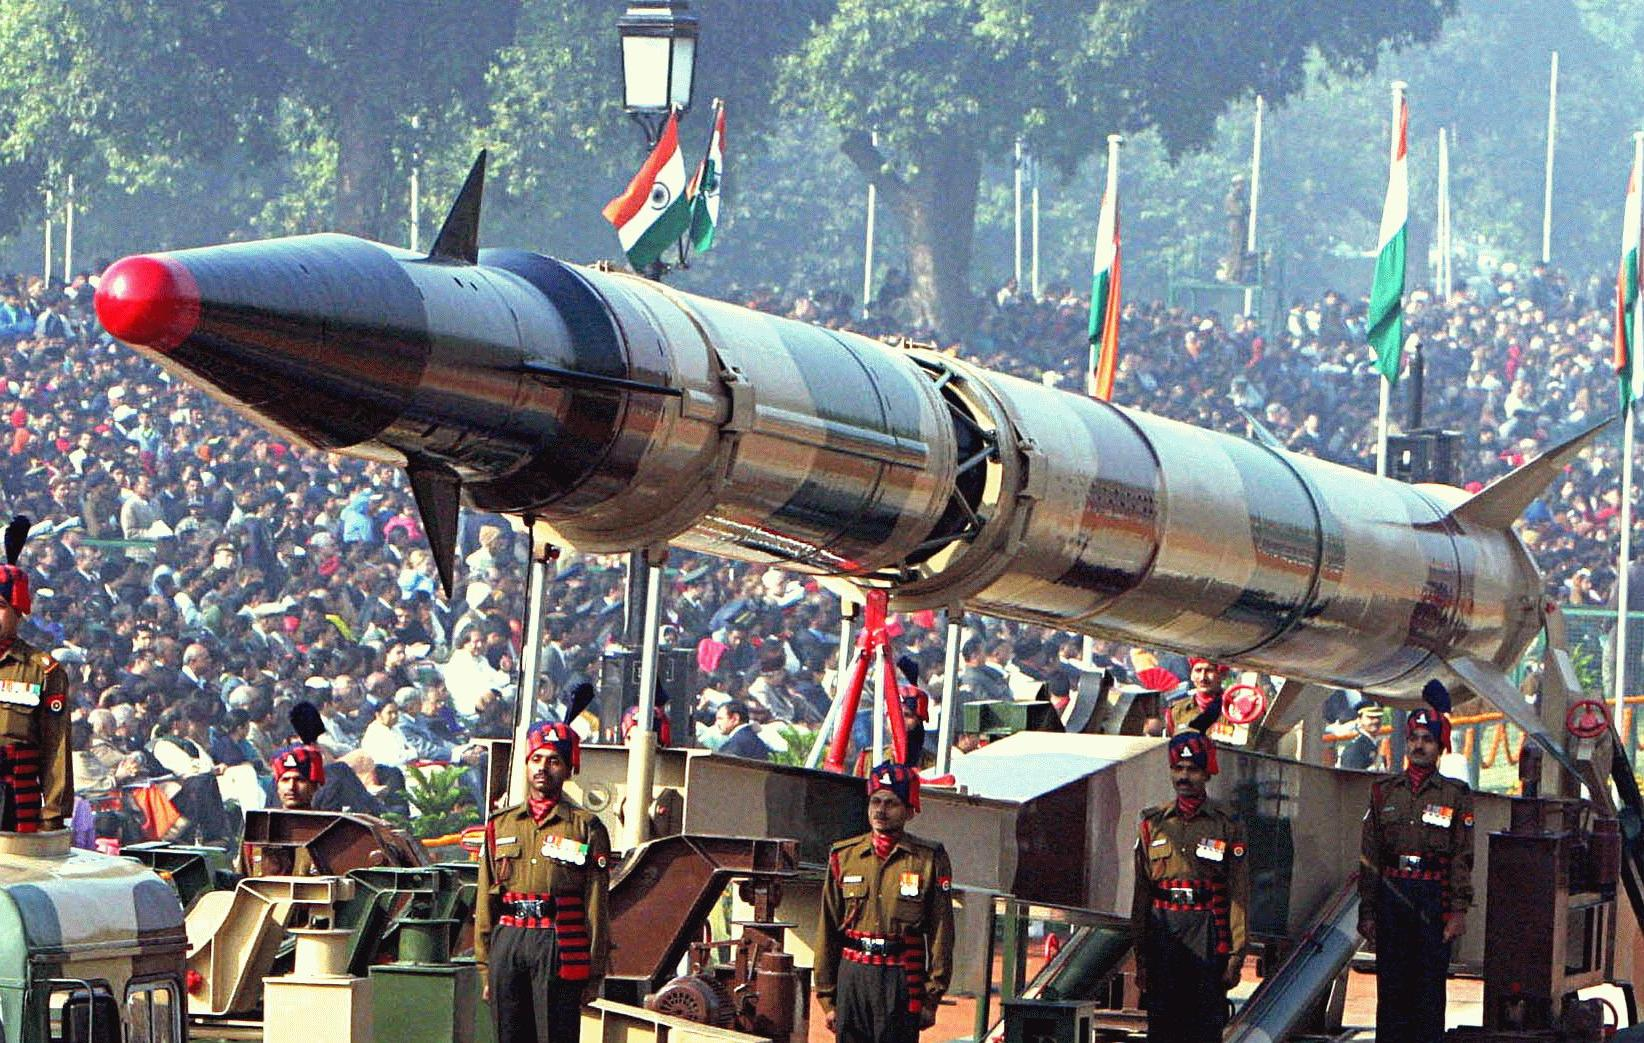 India prueba misiles capaces de transportar cabezas nucleares